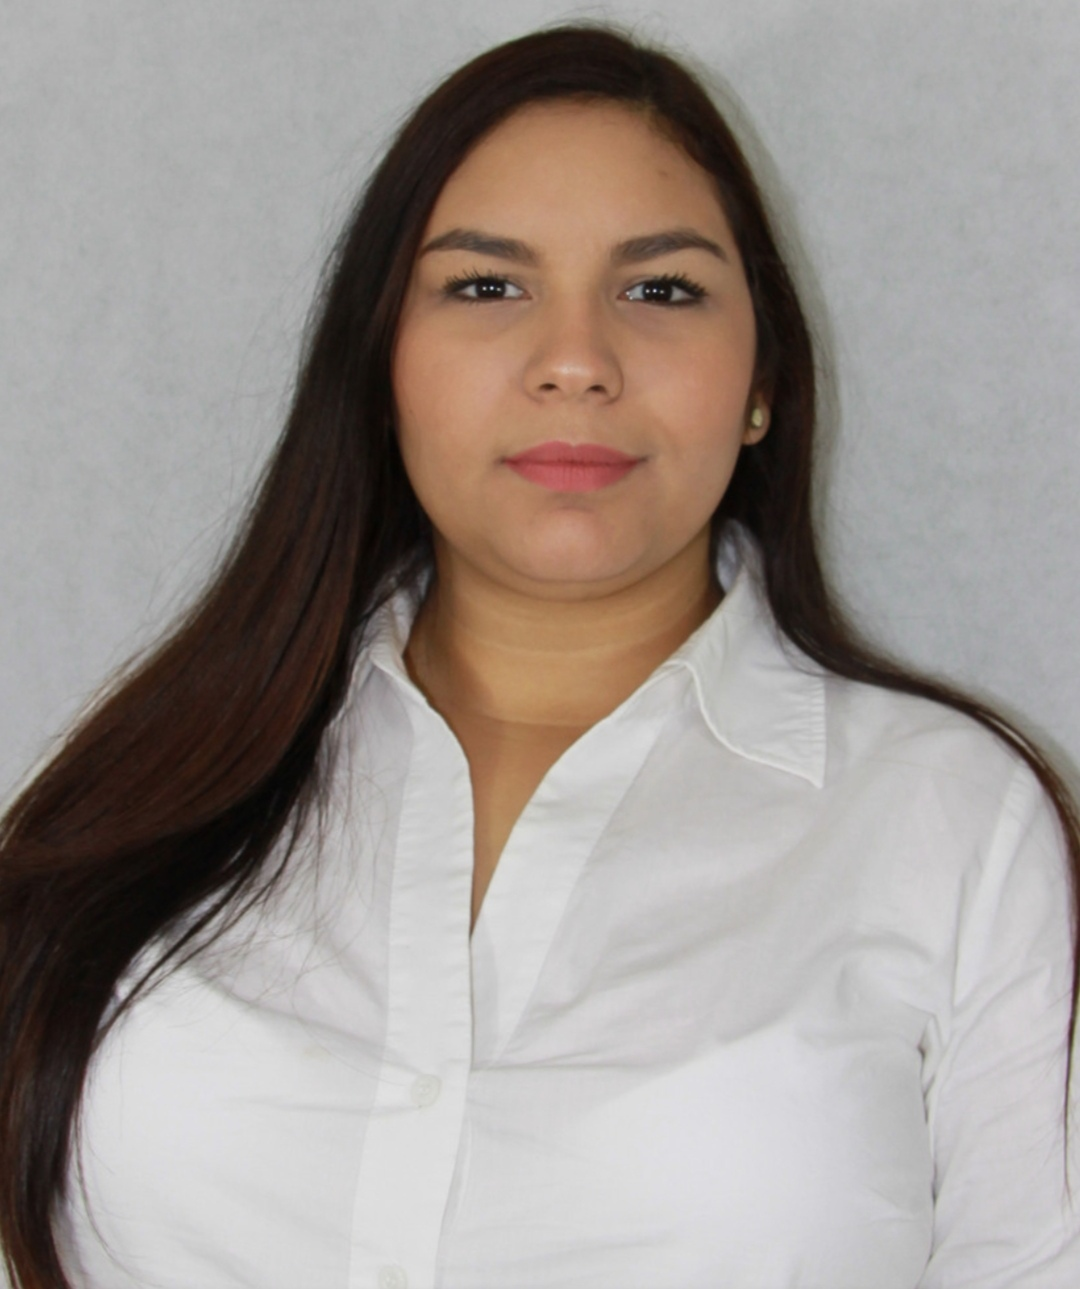 Ellen Vargas Virkkala